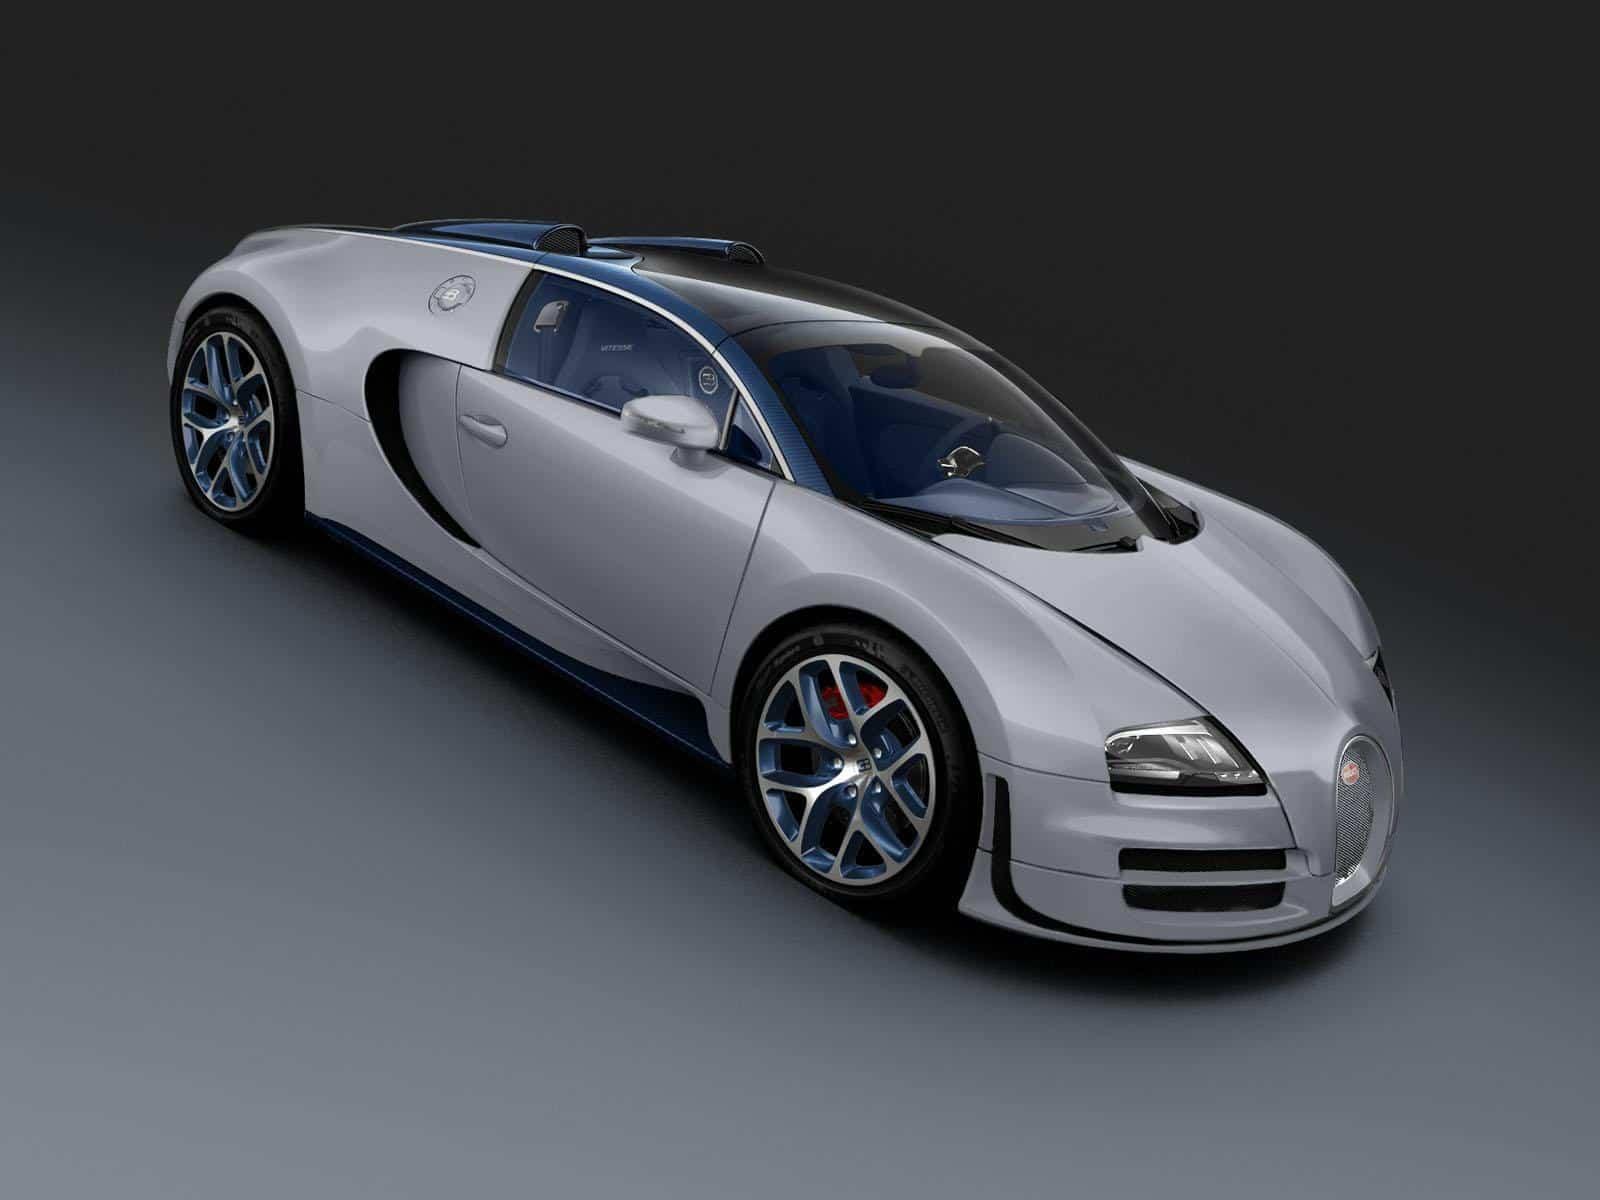 Bugatti-Veyron-16.4-Grand-Sport-Vitesse-Rafale-Edition-1 Interesting Bugatti Veyron Grand Sport Vitesse Vs Pagani Huayra Cars Trend